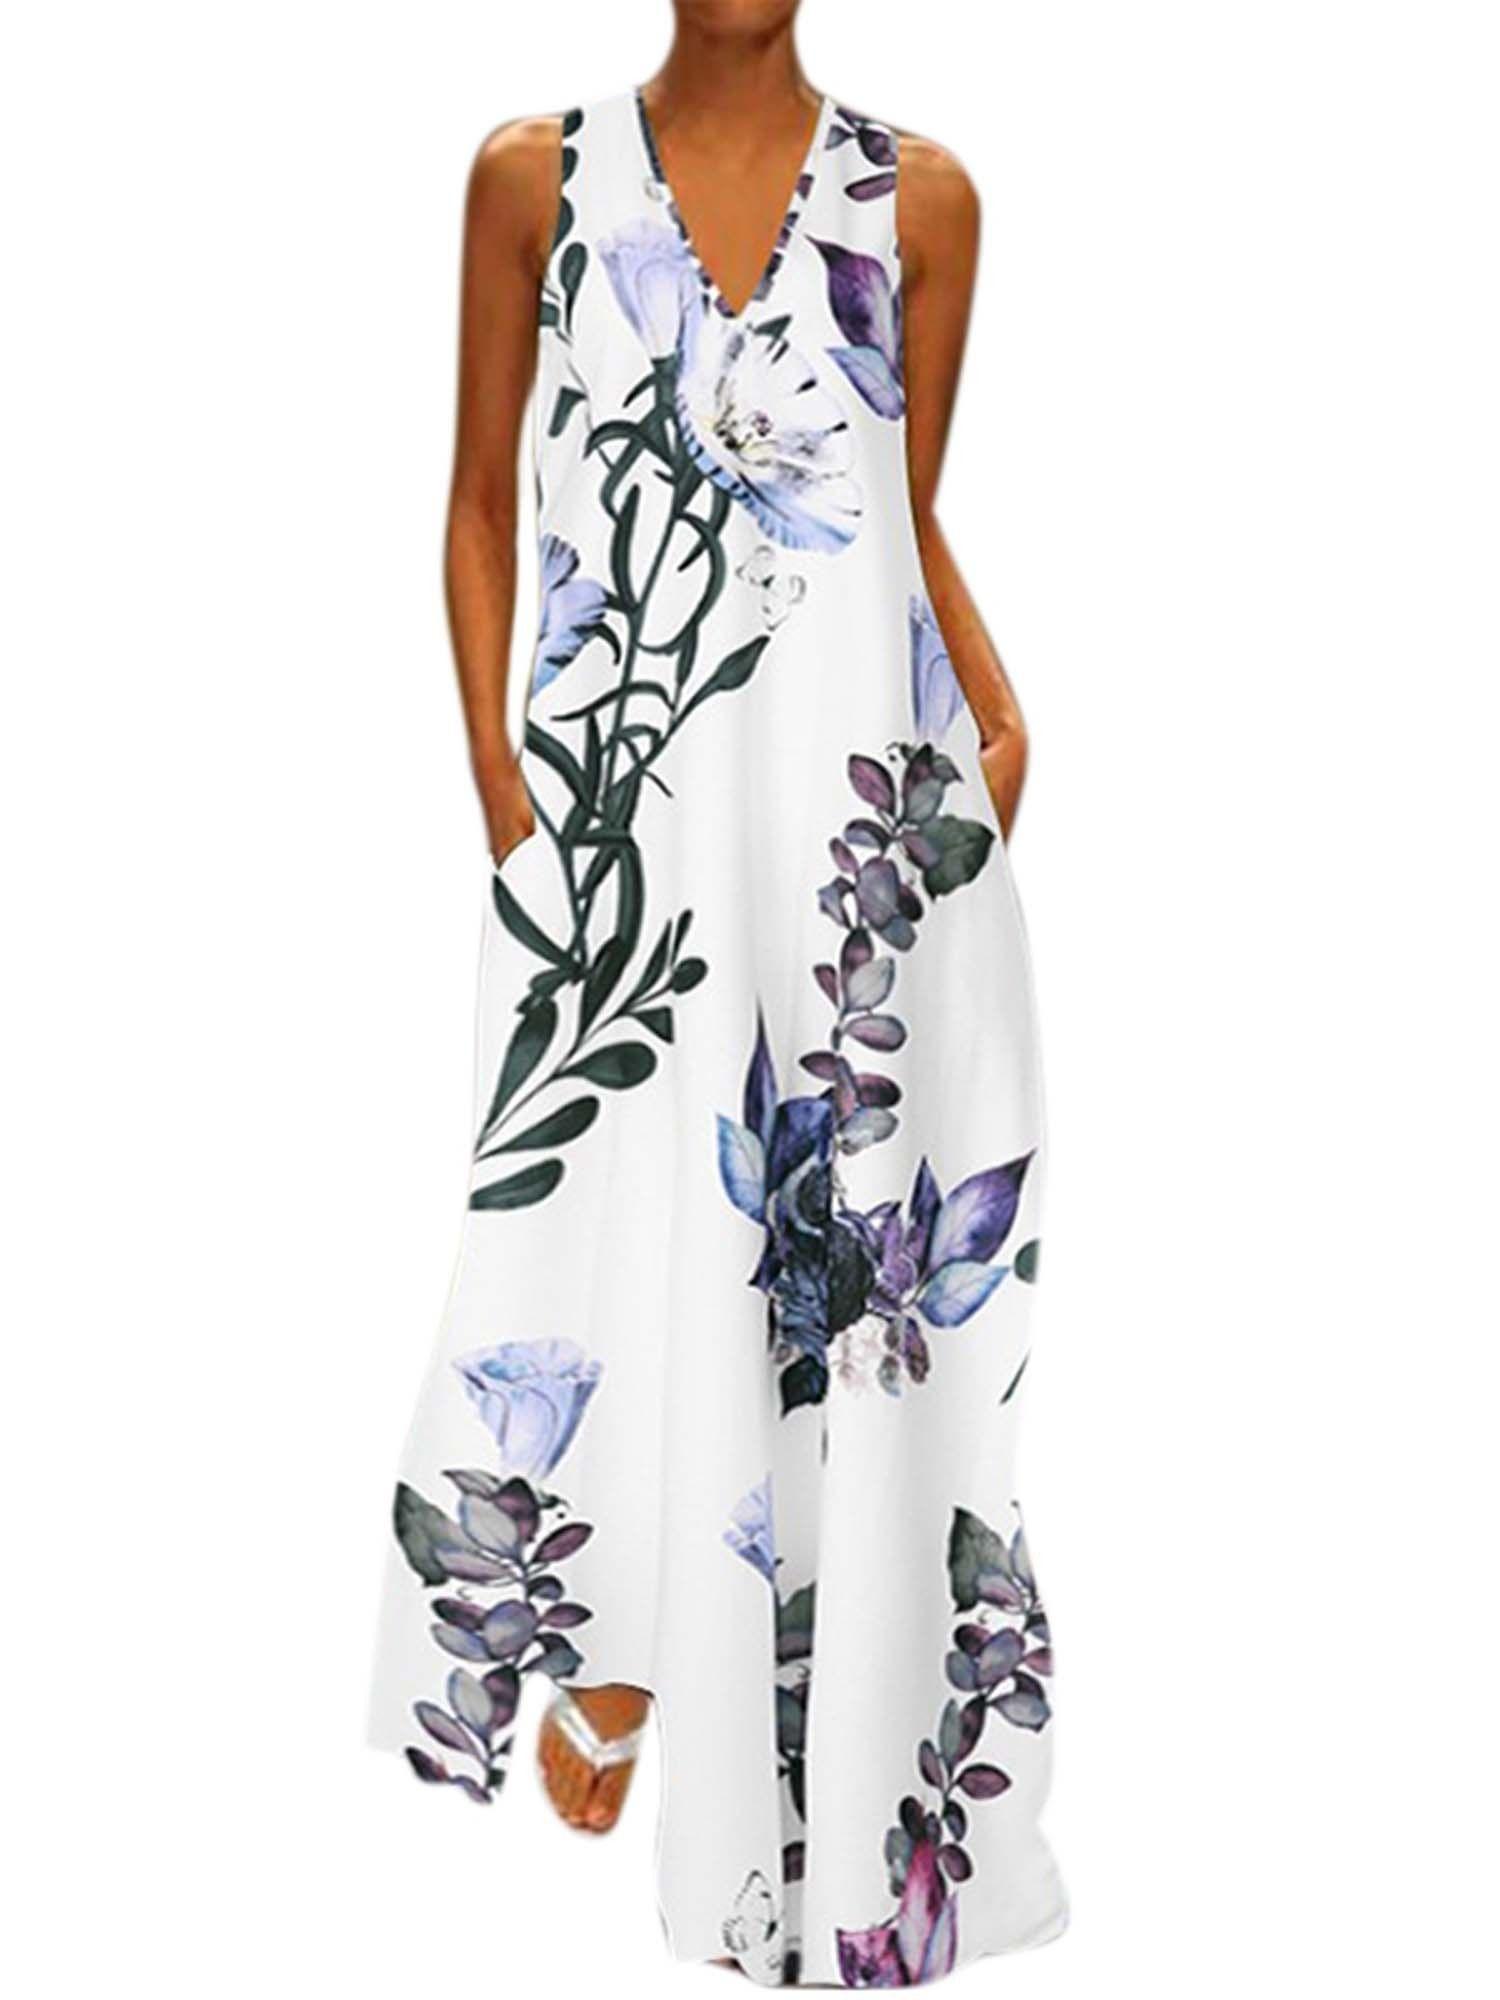 Moloke Women Women S V Neck Boho Floral Sleeveless Maxi Dresses Plus Size Summer Sundress Plus Size Maxi Dresses Maxi Dress Evening Long Maxi Dress [ 2000 x 1500 Pixel ]